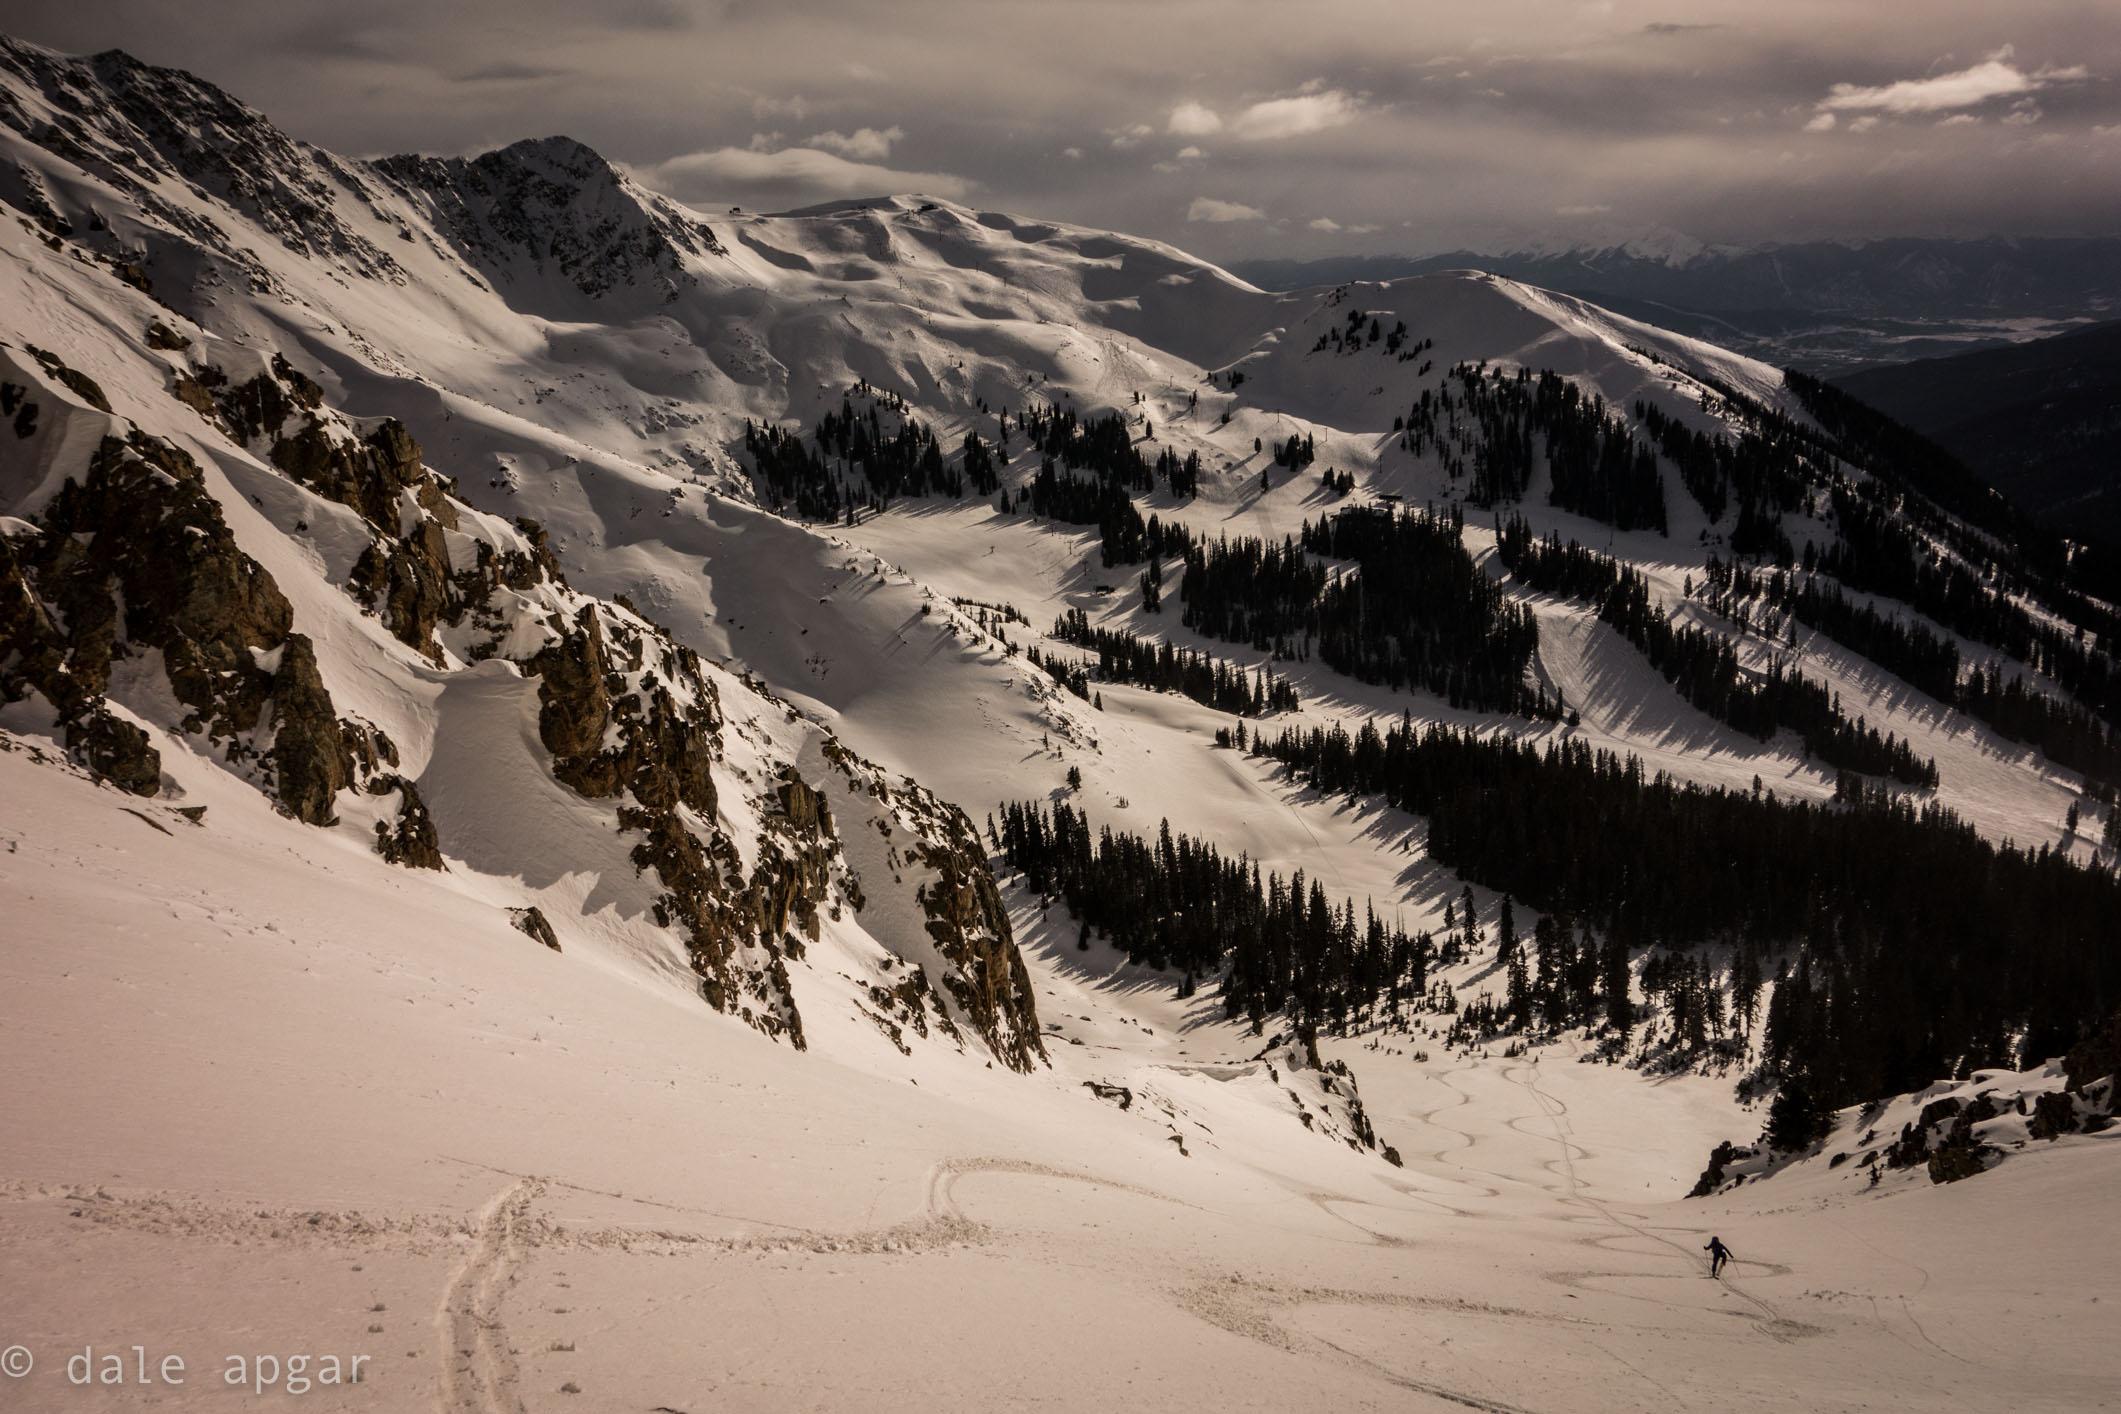 dale_apgar_ski-30.jpg